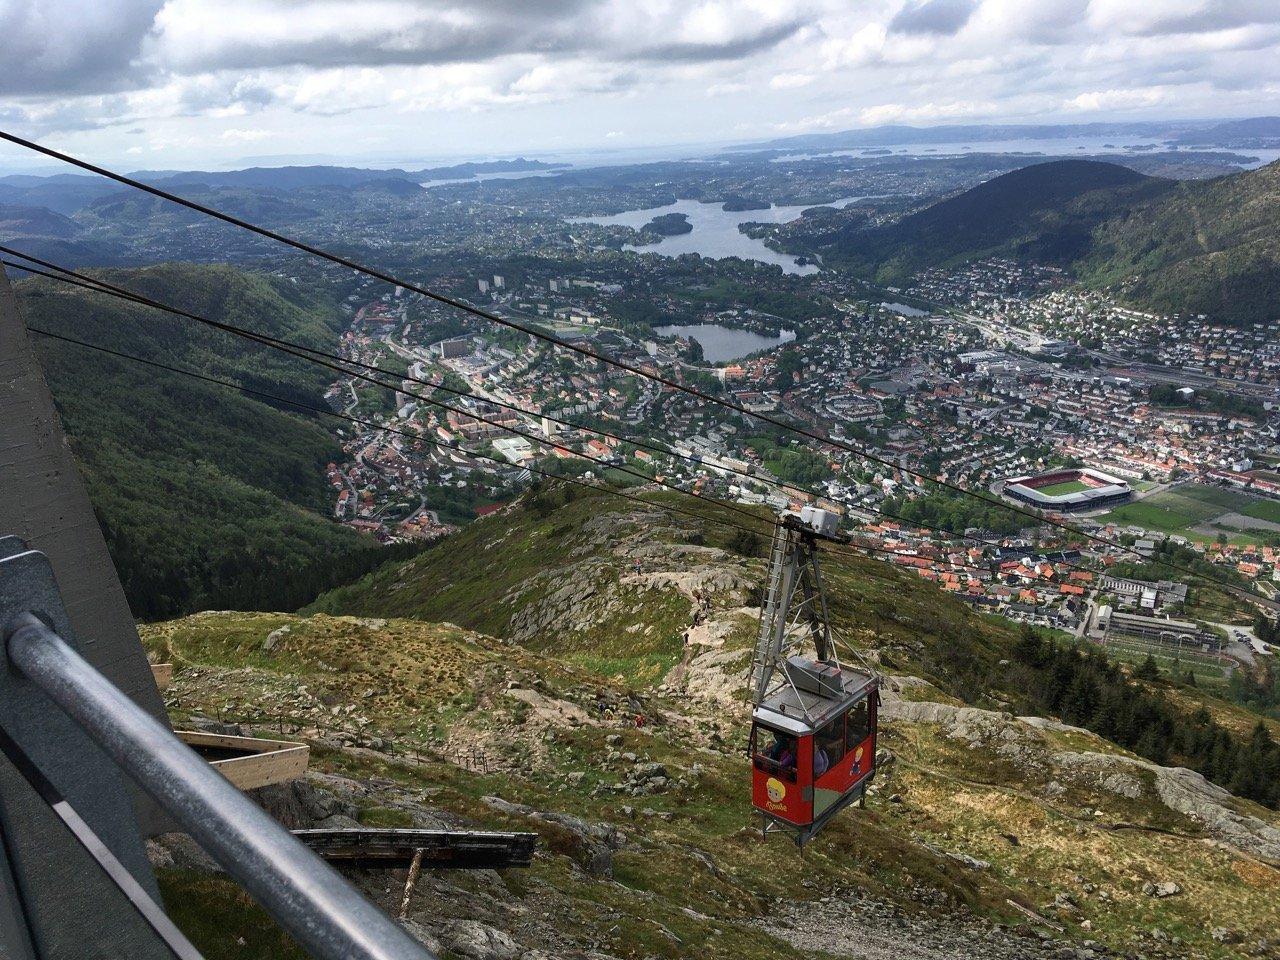 Ulriksbanen cable car line. Photo.